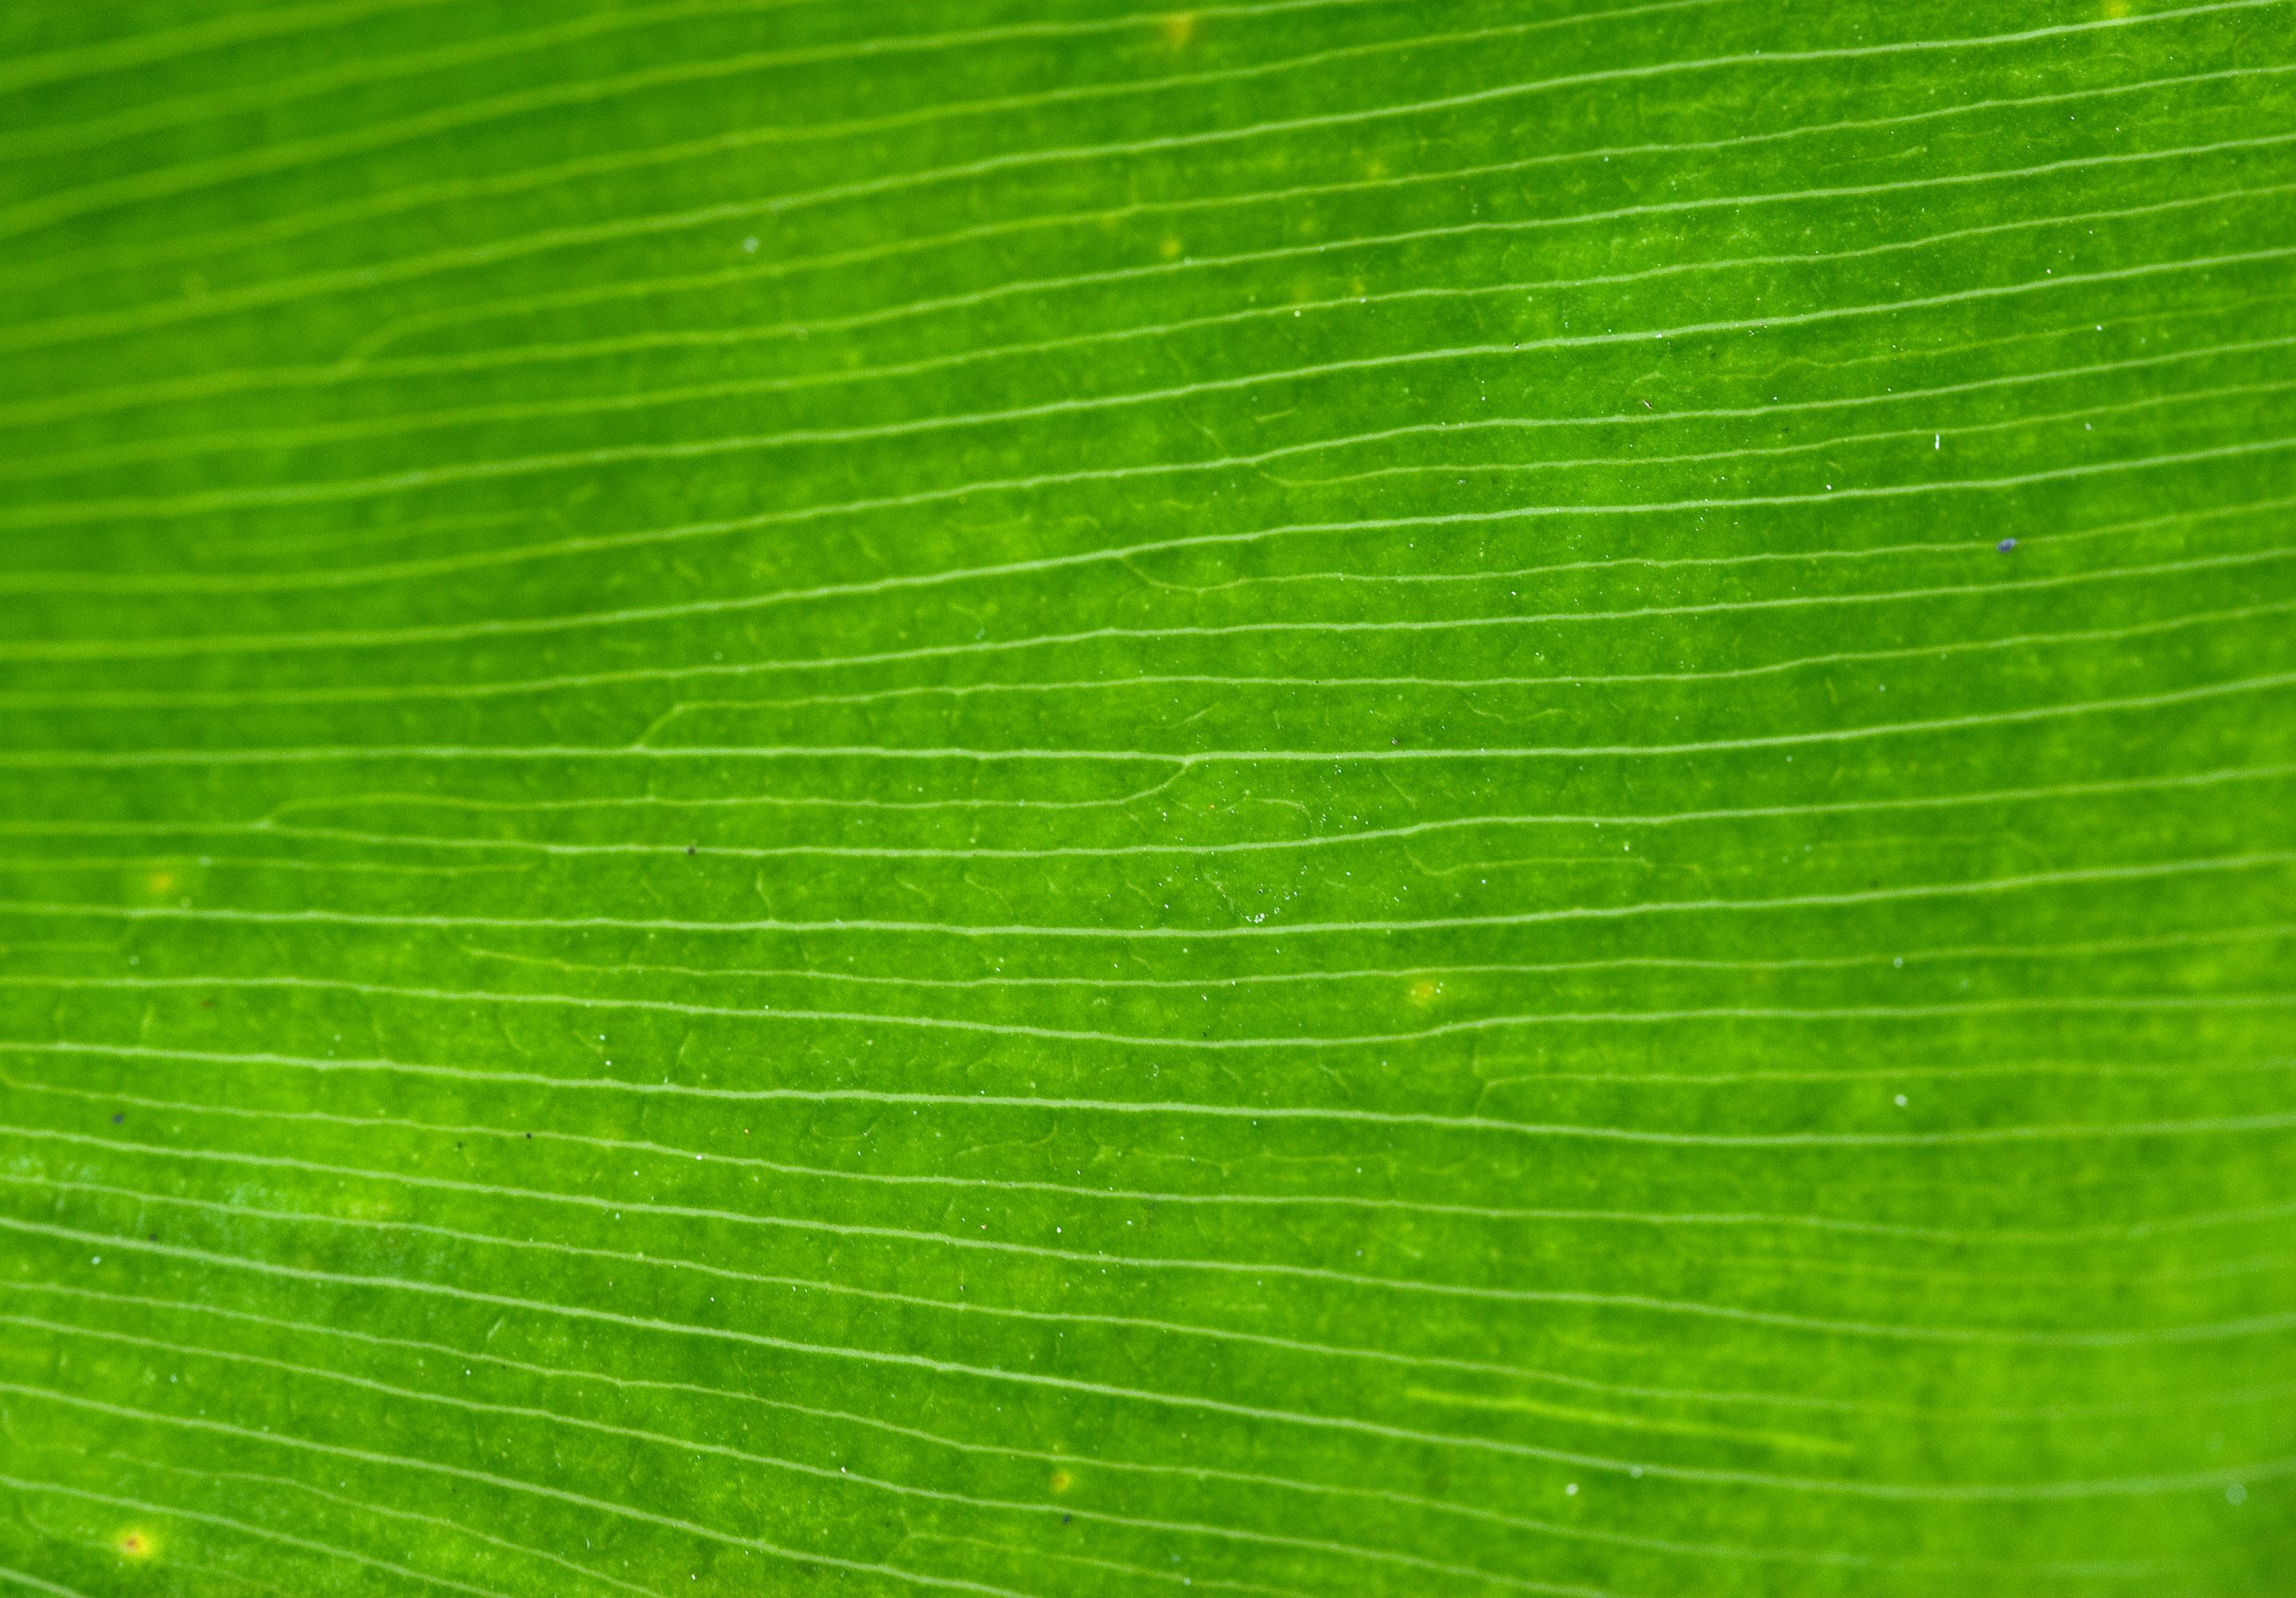 close up of green leaf background image